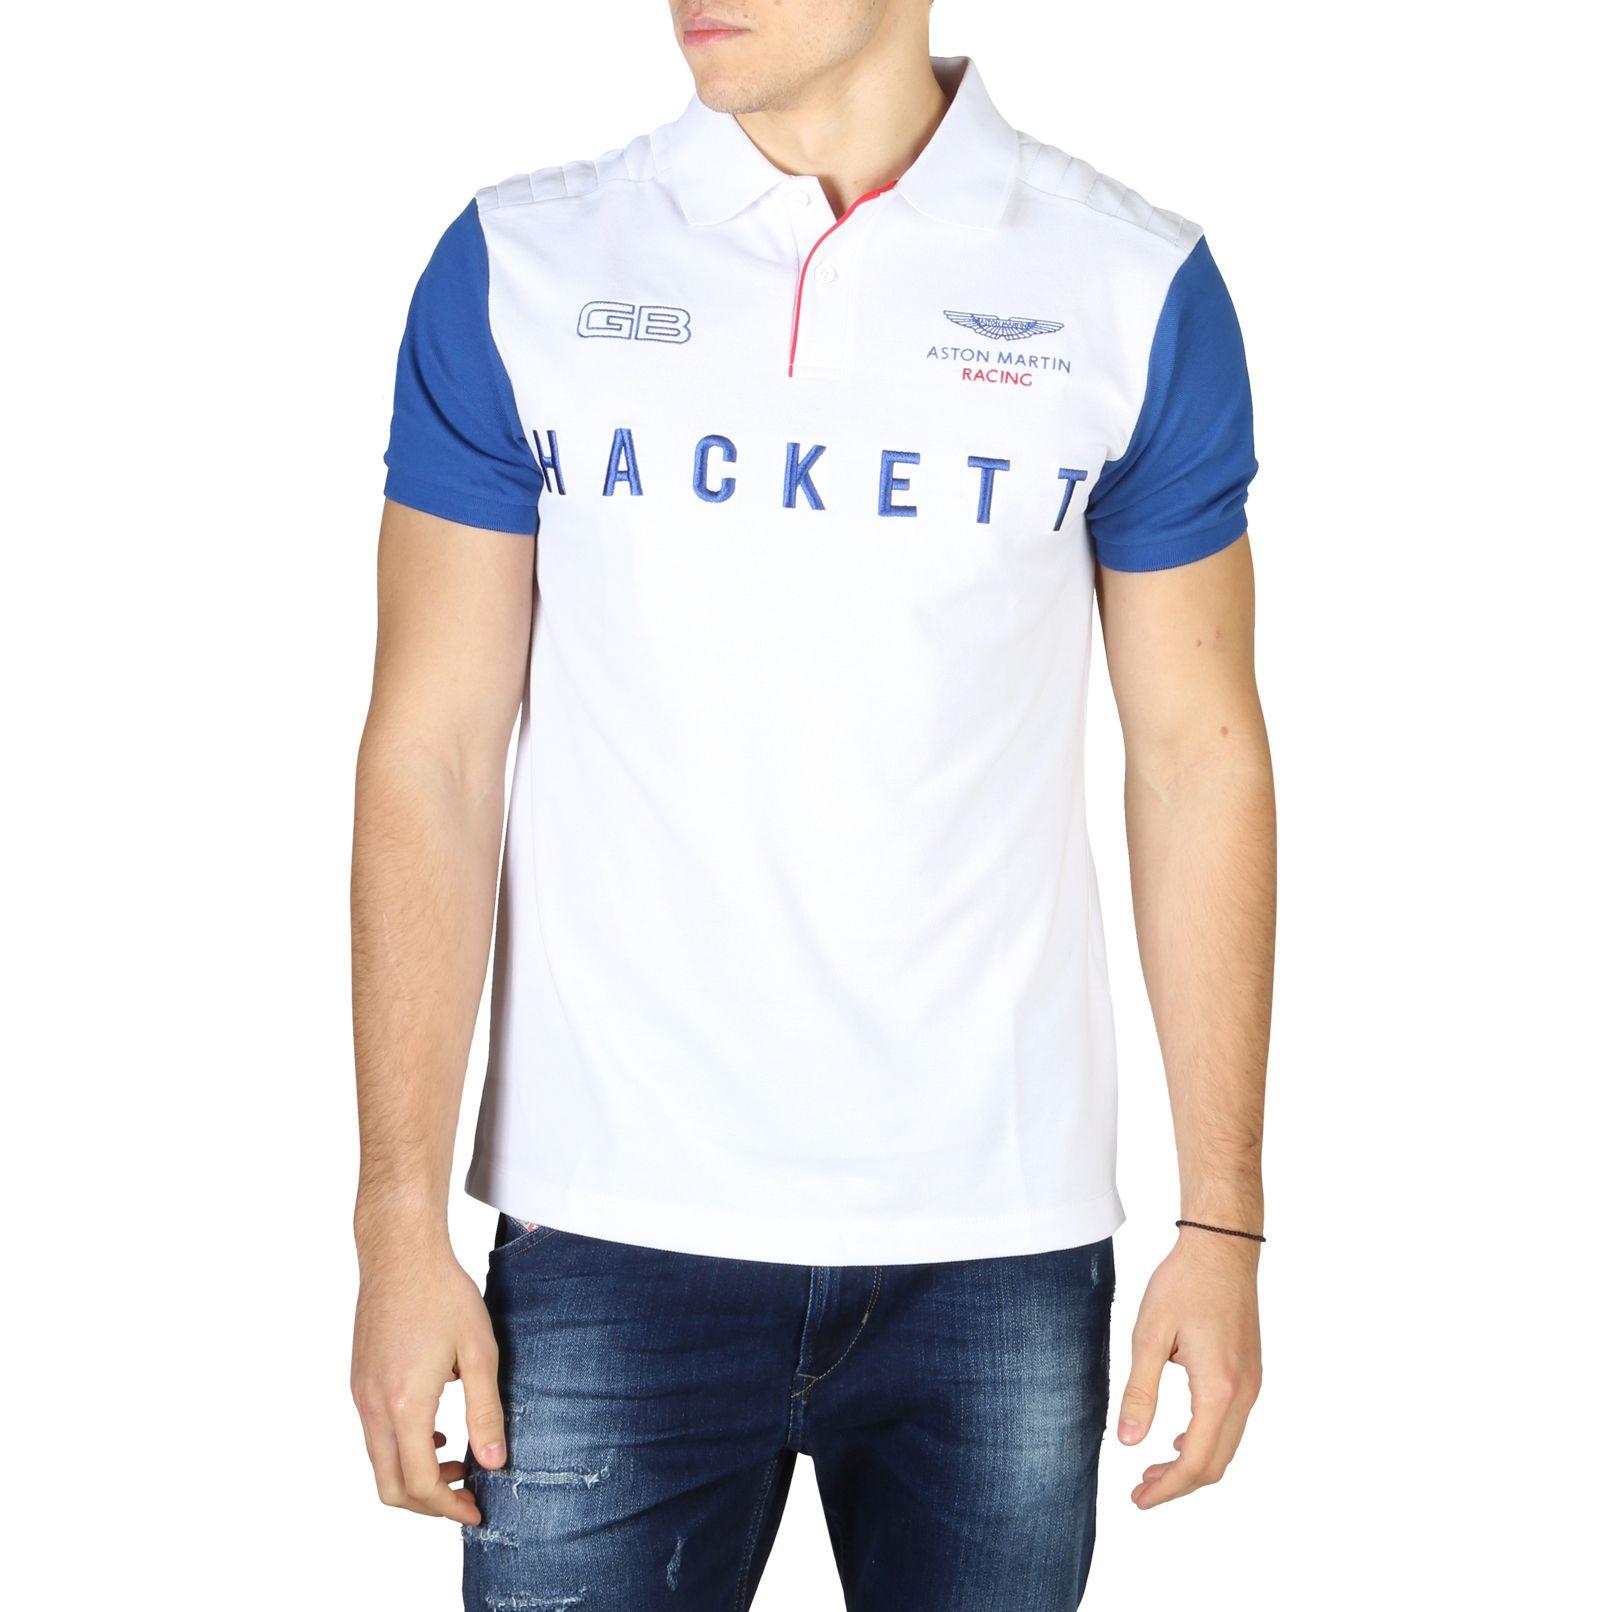 Hackett – HM562678 – Blanc